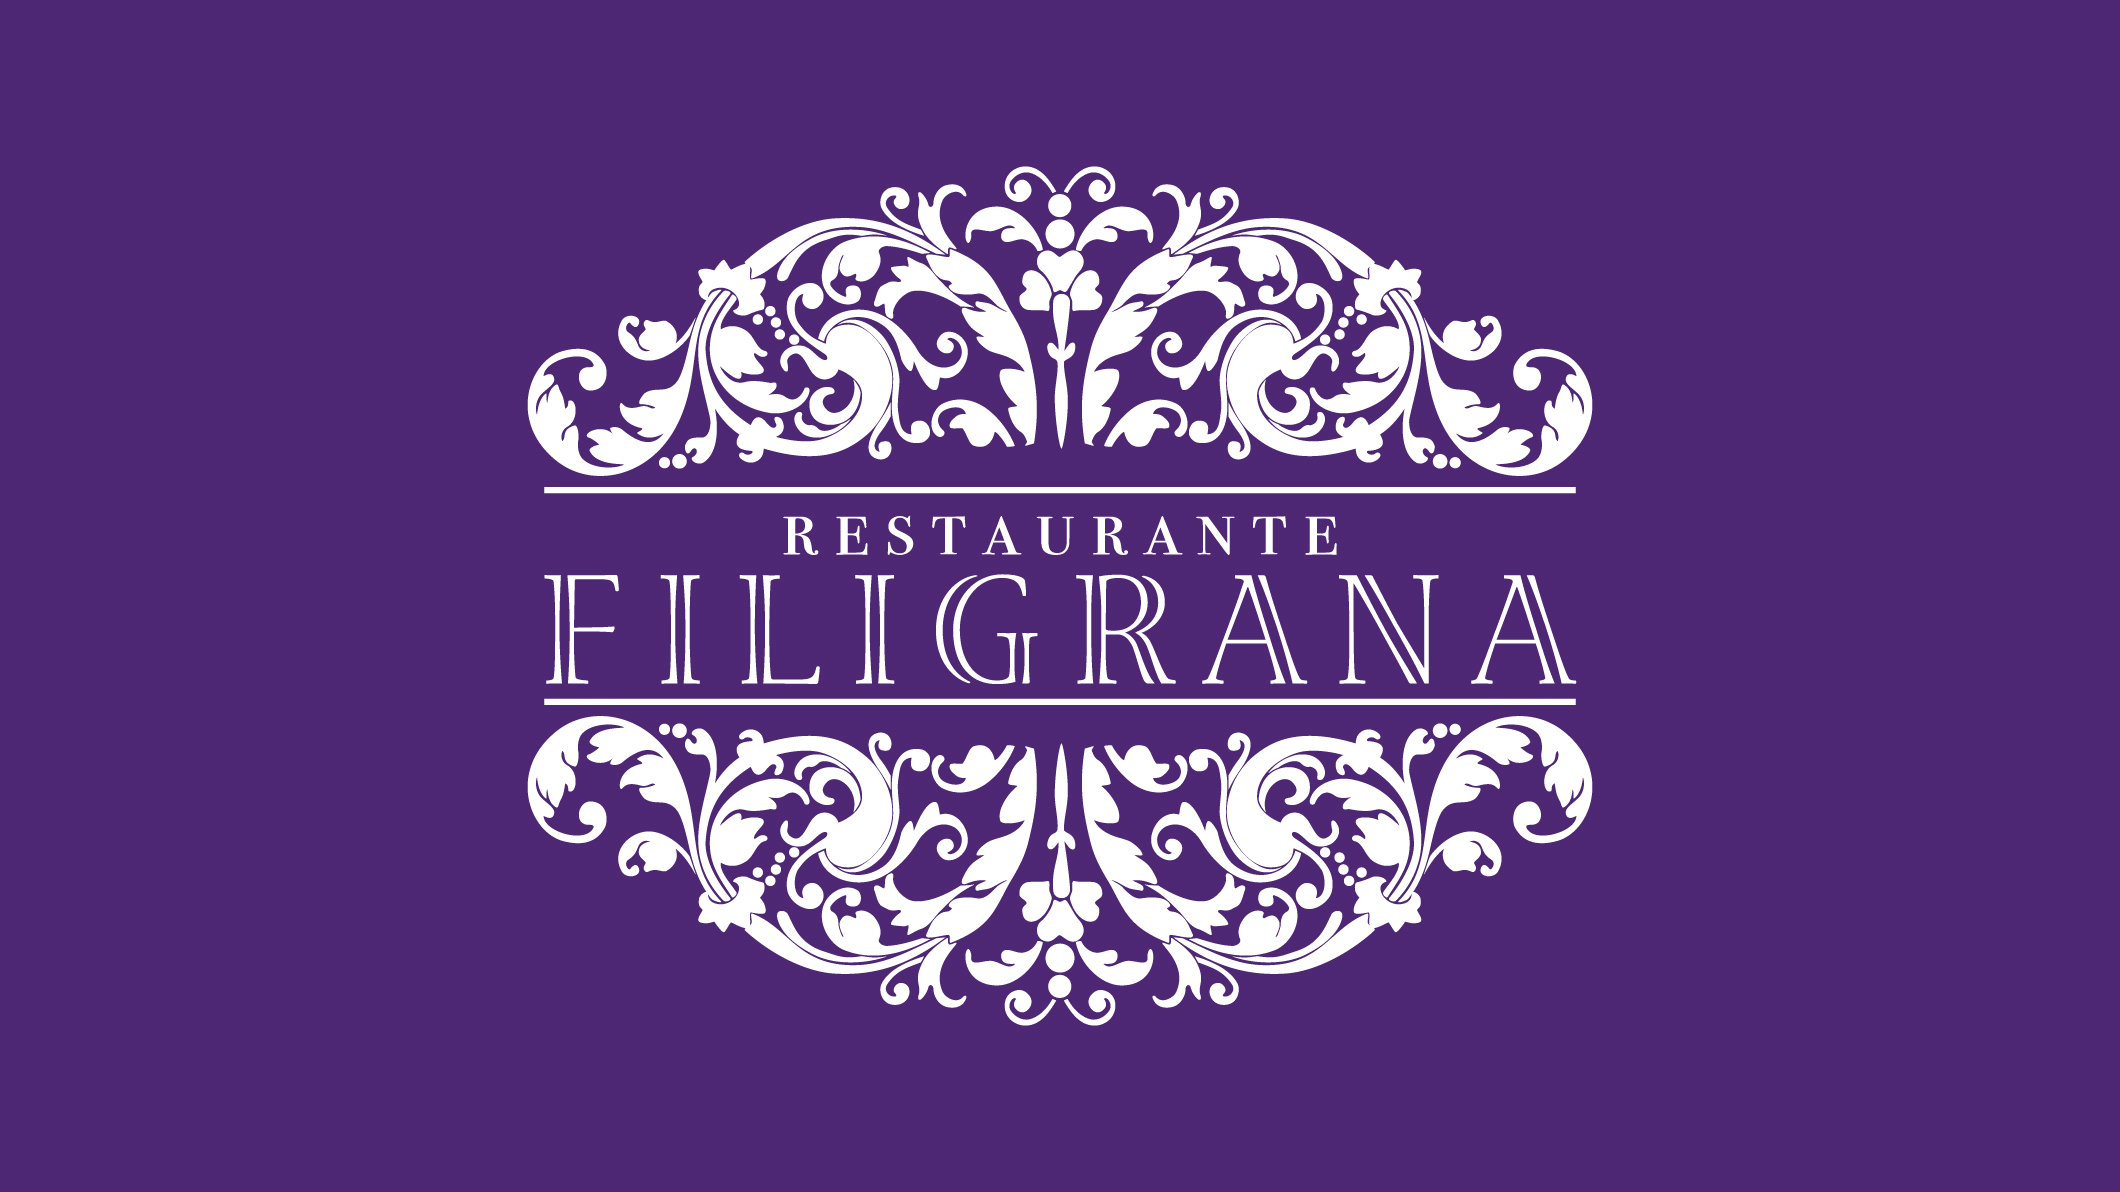 restaurante-filigrana-santiago-de-compostela